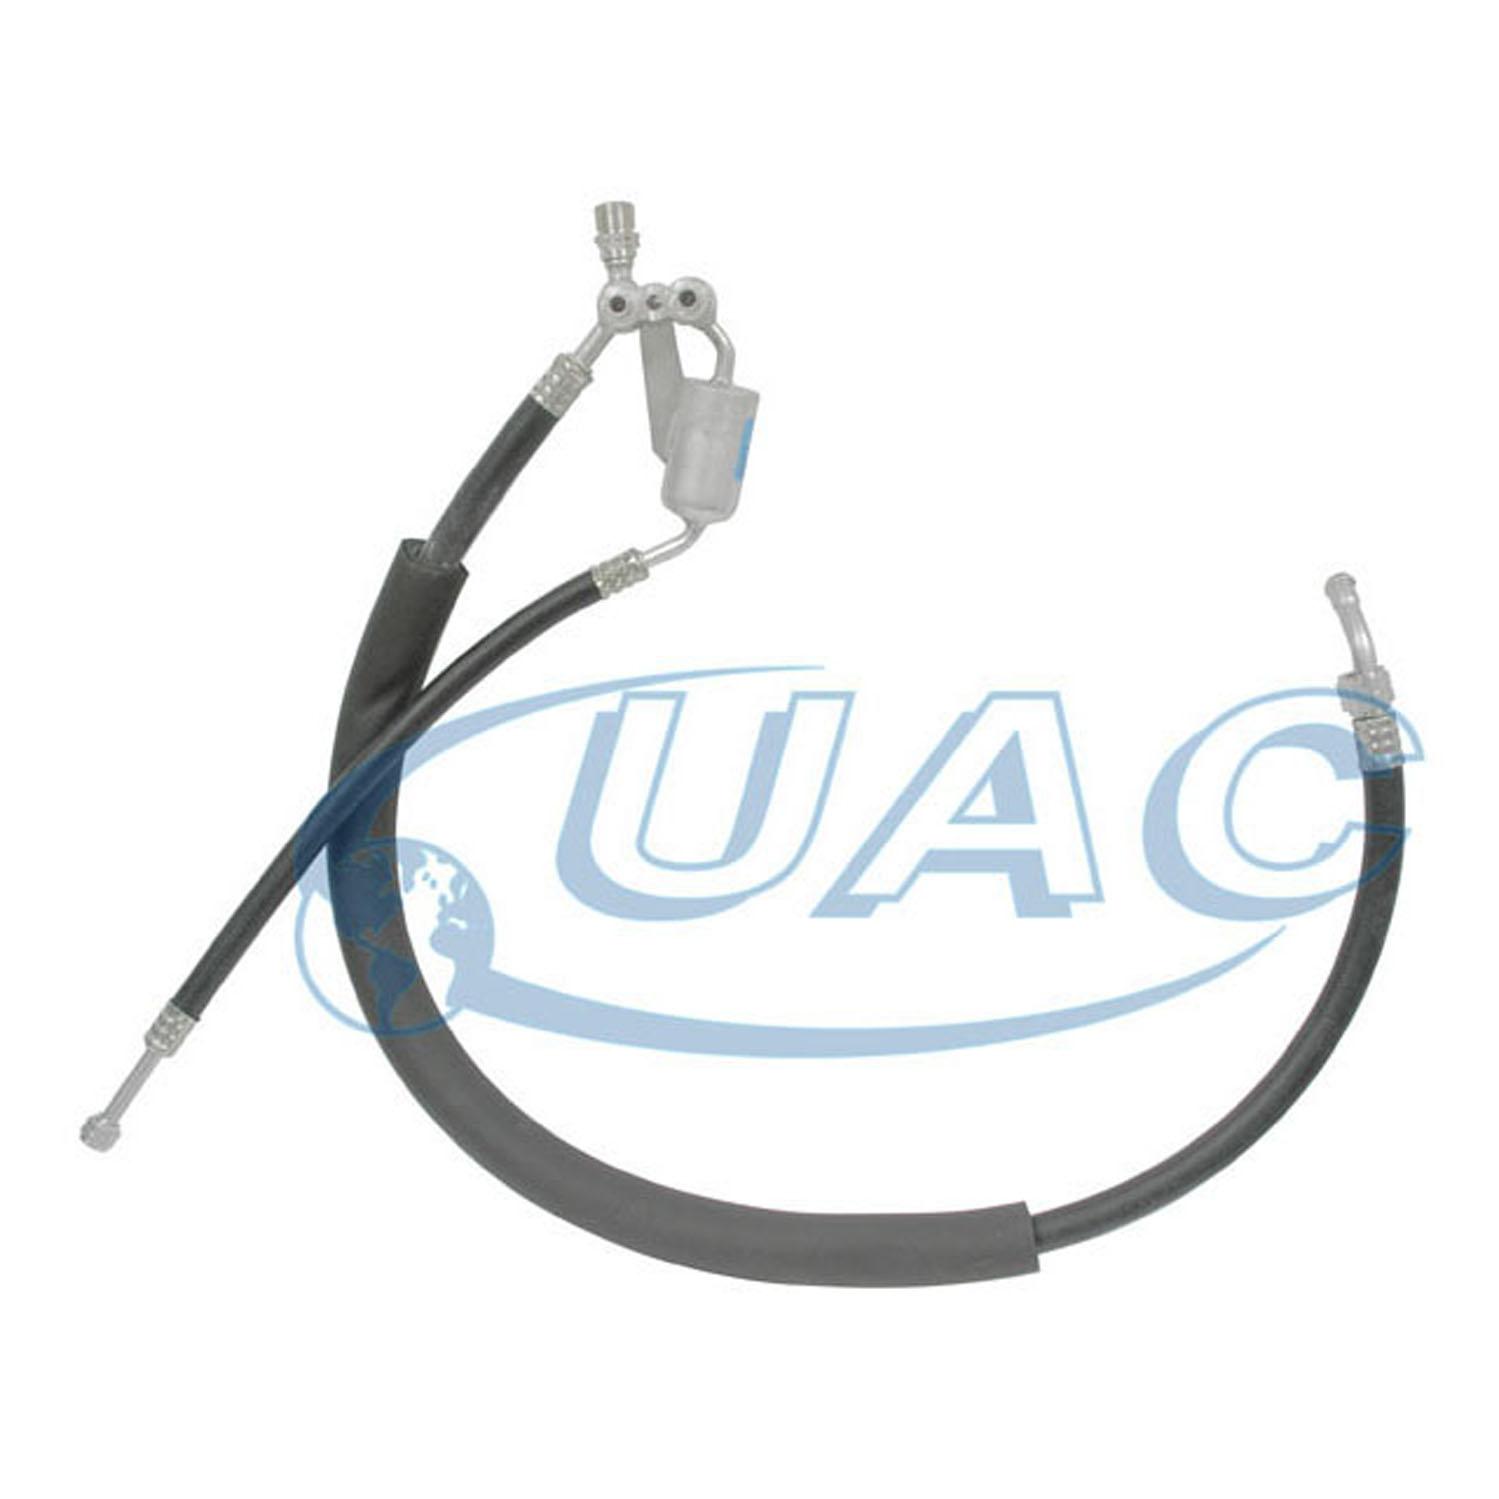 New Compressor Manifold Hose Assembly 75-10444